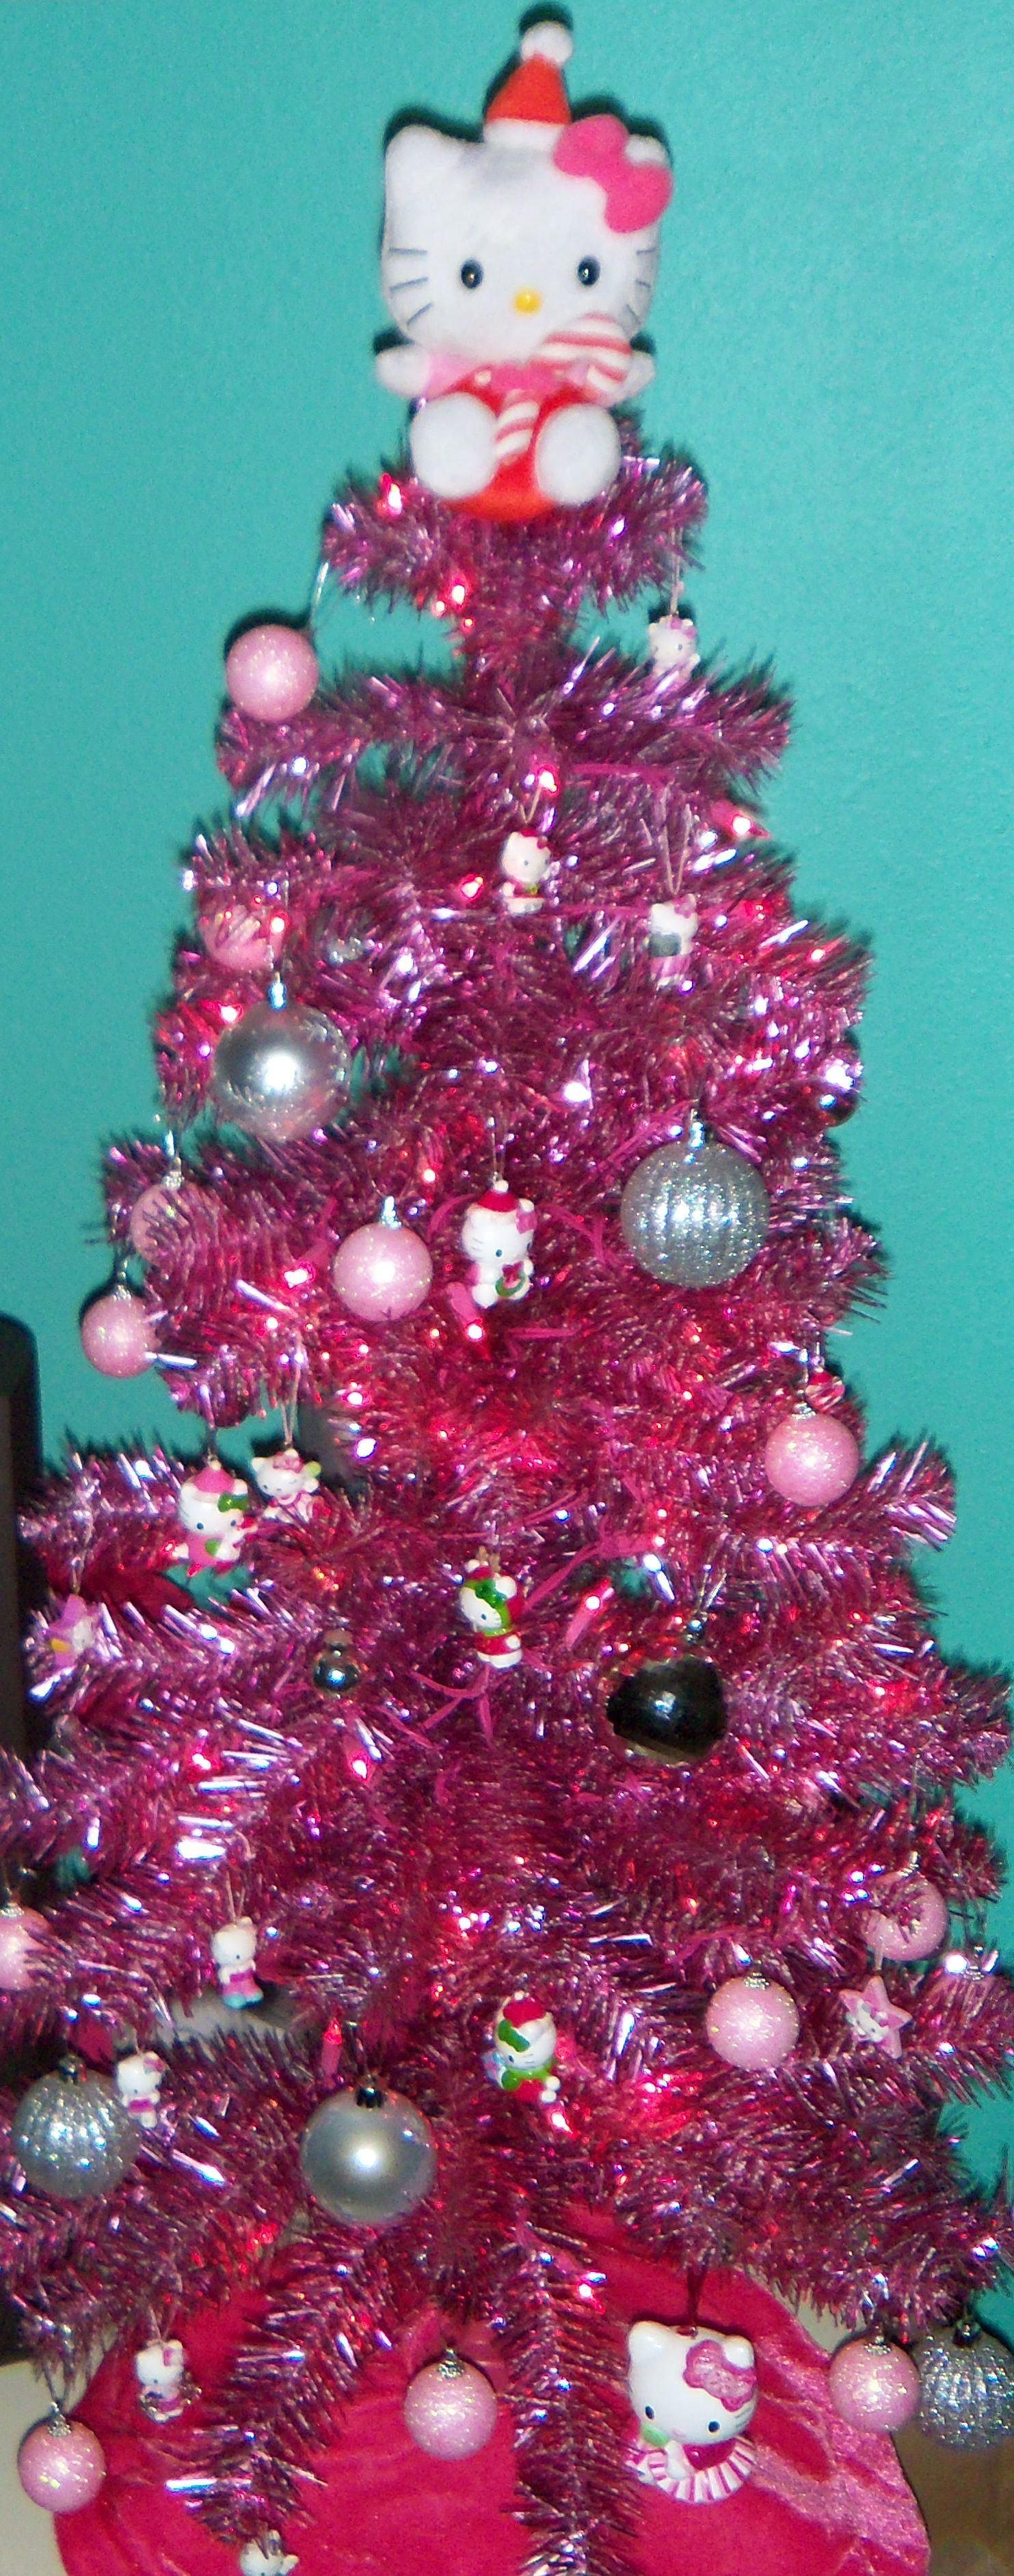 Hello Kitty Christmas Tree.Pink Hello Kitty Christmas Tree Lol My Hubby Made Ours Hello